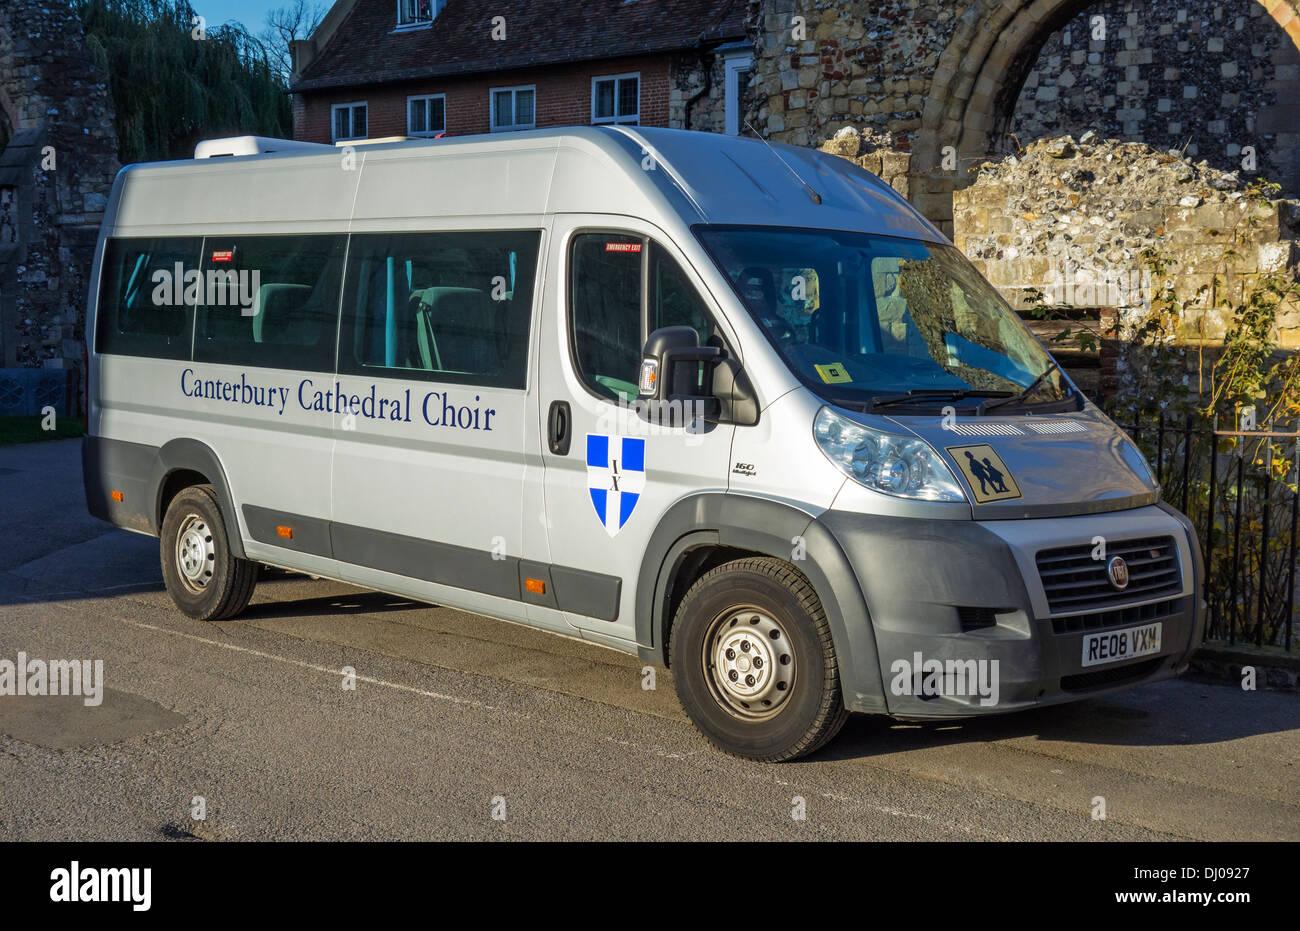 Canterbury Cathedral Choir Fiat Minibus - Stock Image